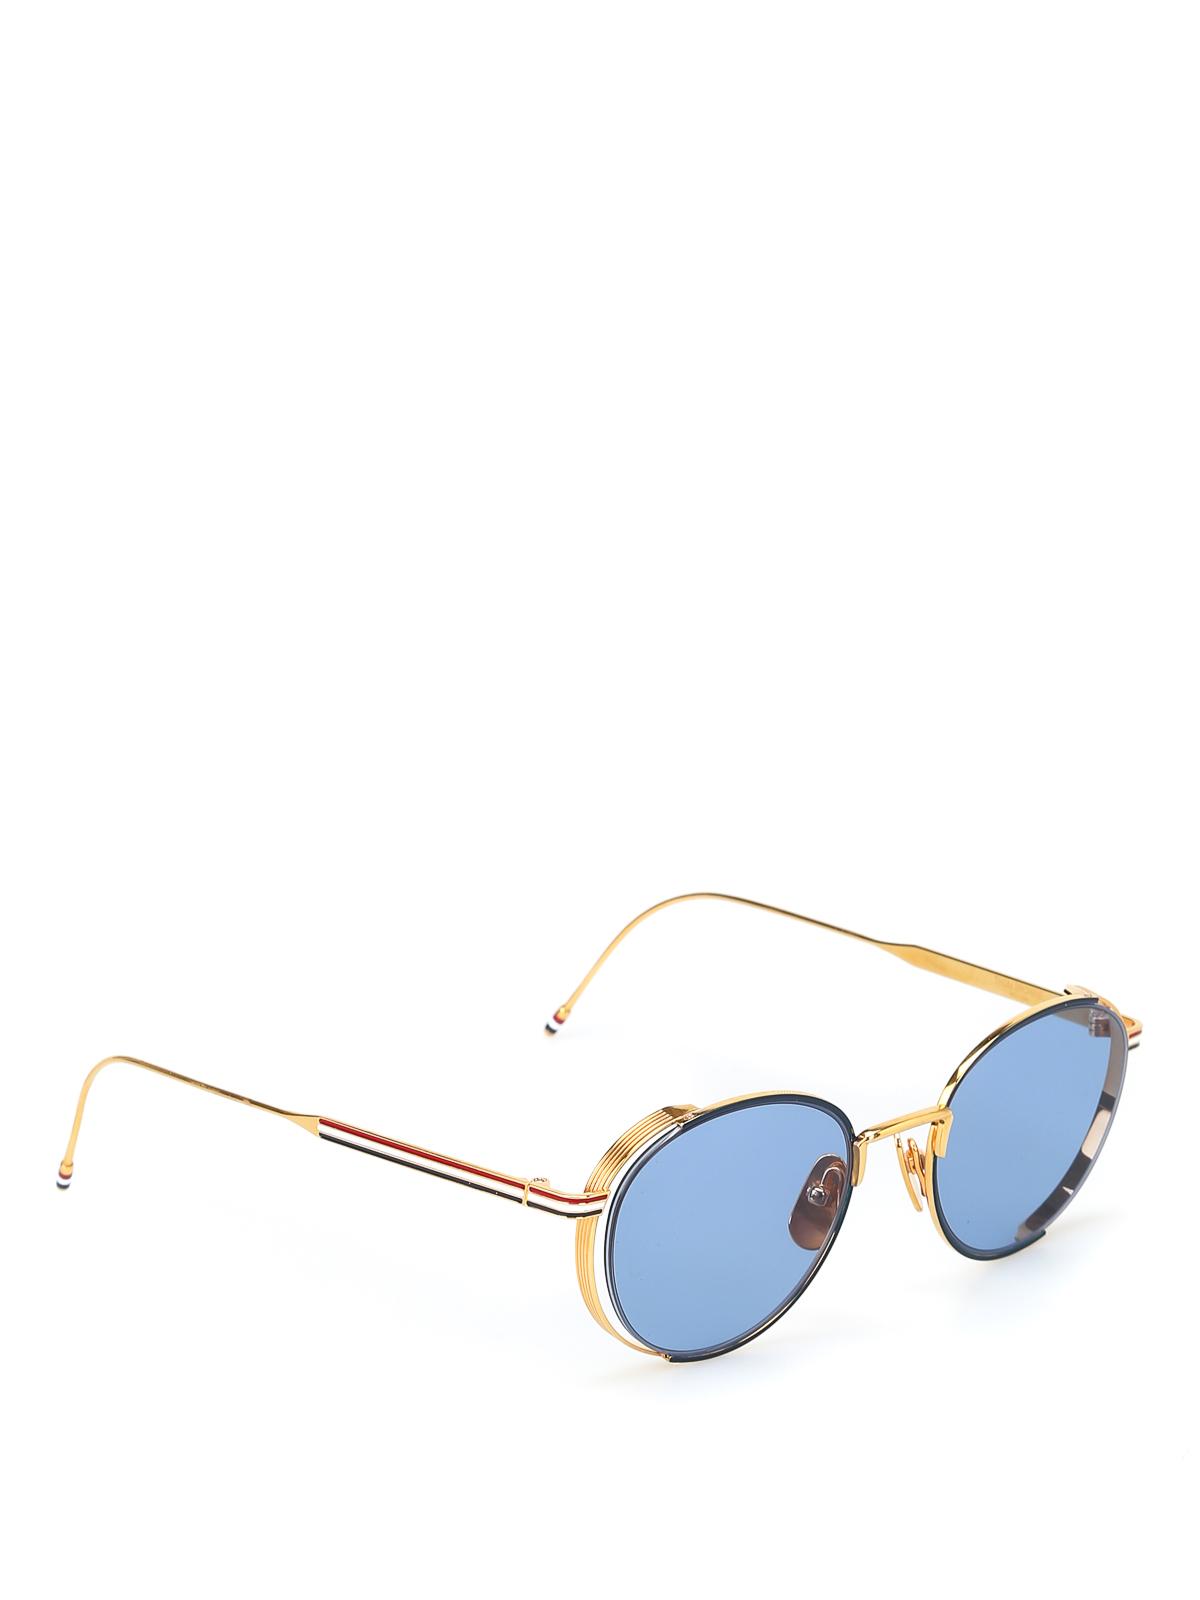 96710973d2 Thom Browne - Tricolour sunglasses - sunglasses - TB 106C NVY GLD 50